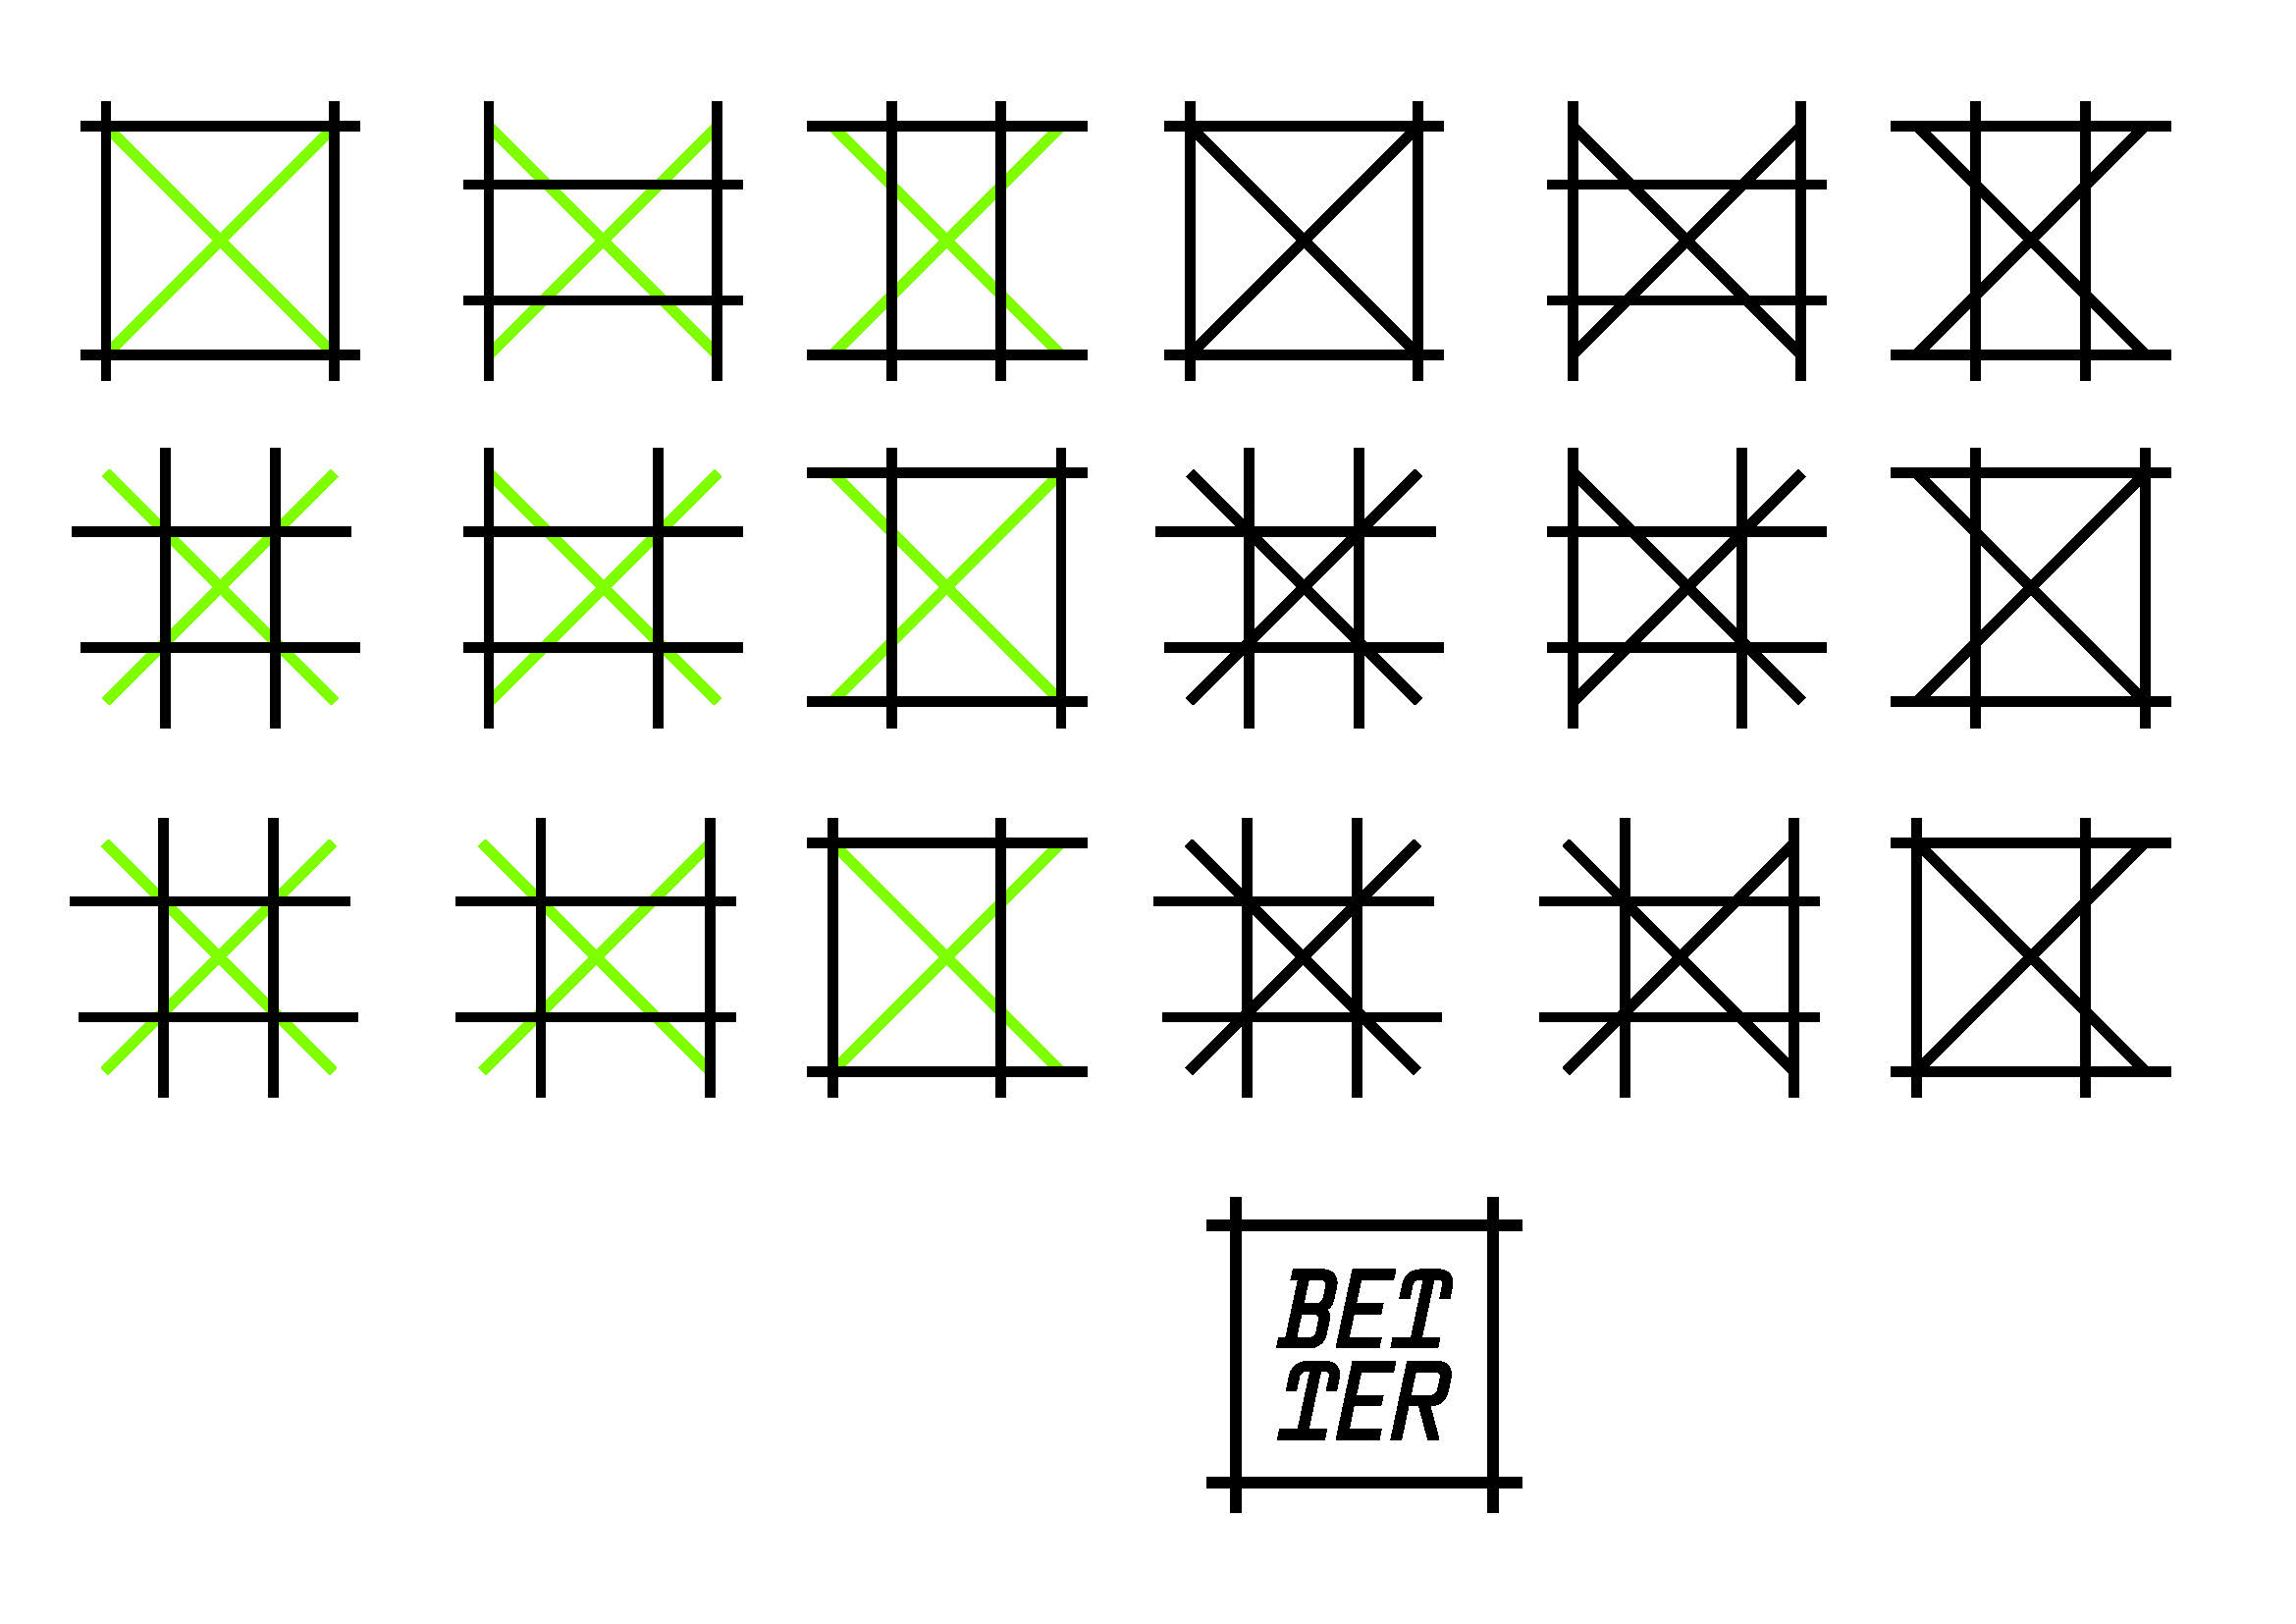 bettercph_logo+businesscard_1_Page_1.jpg